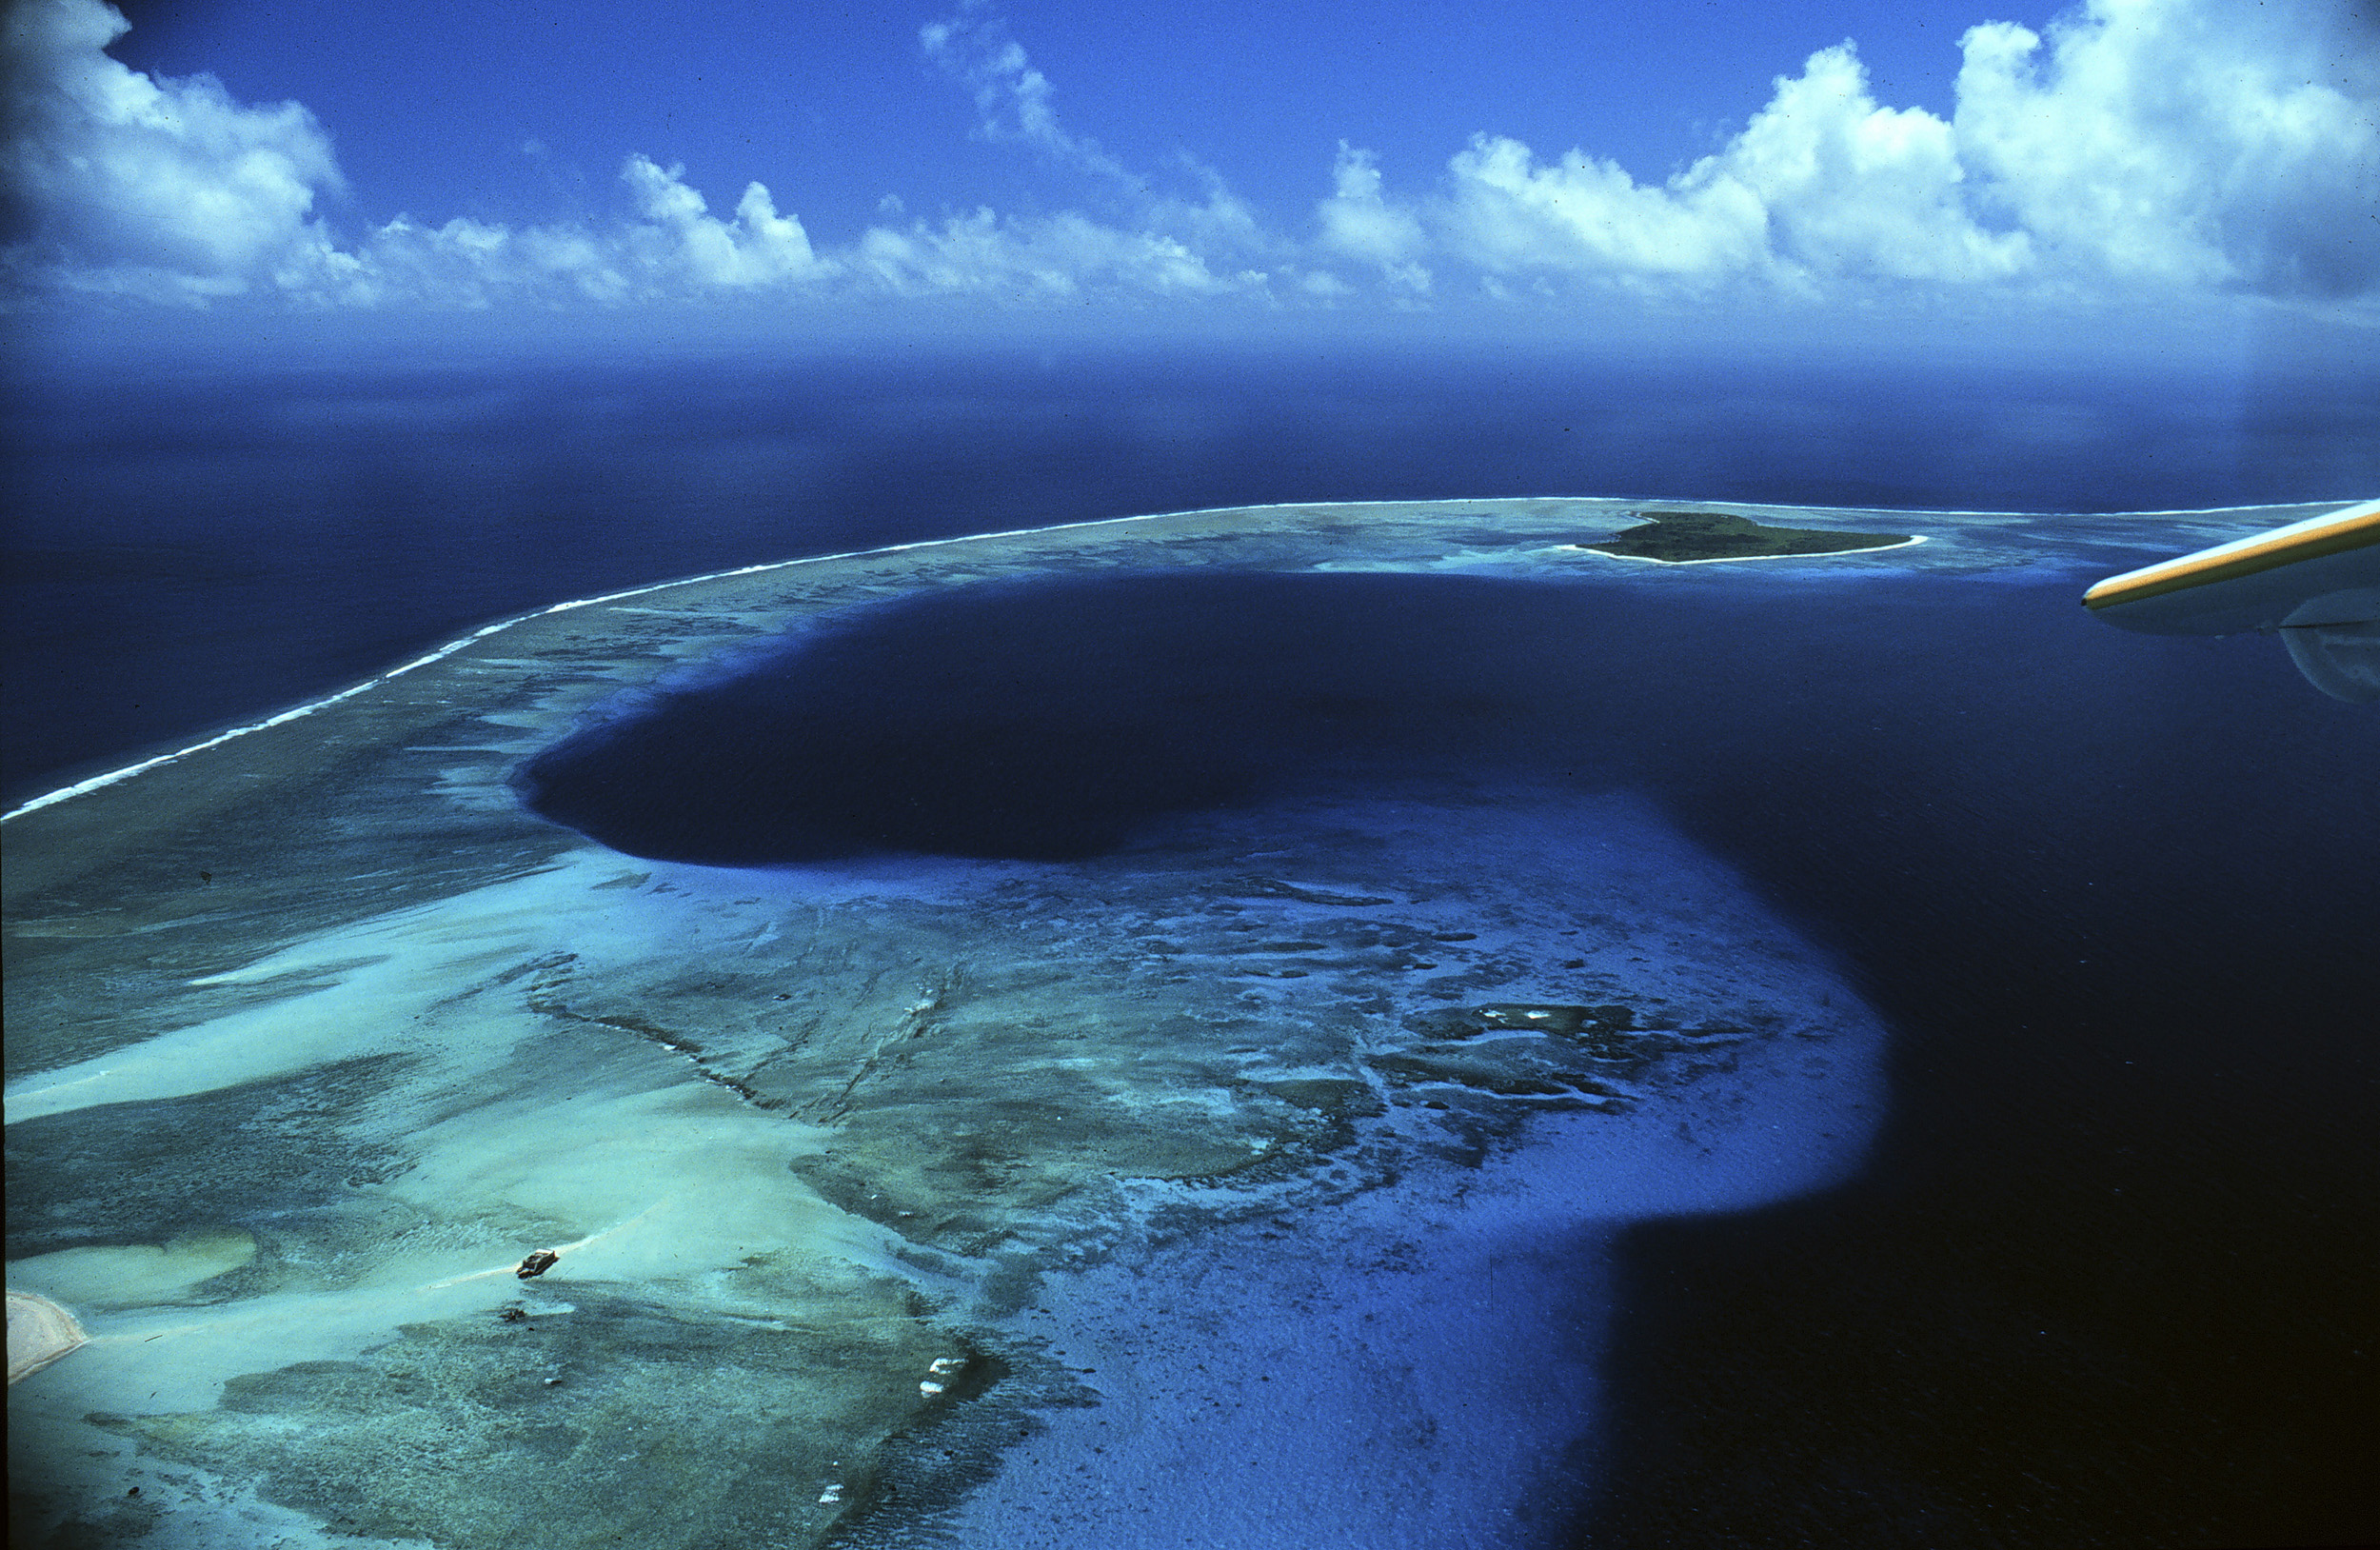 Bikini-Atoll-Marshall-Islands